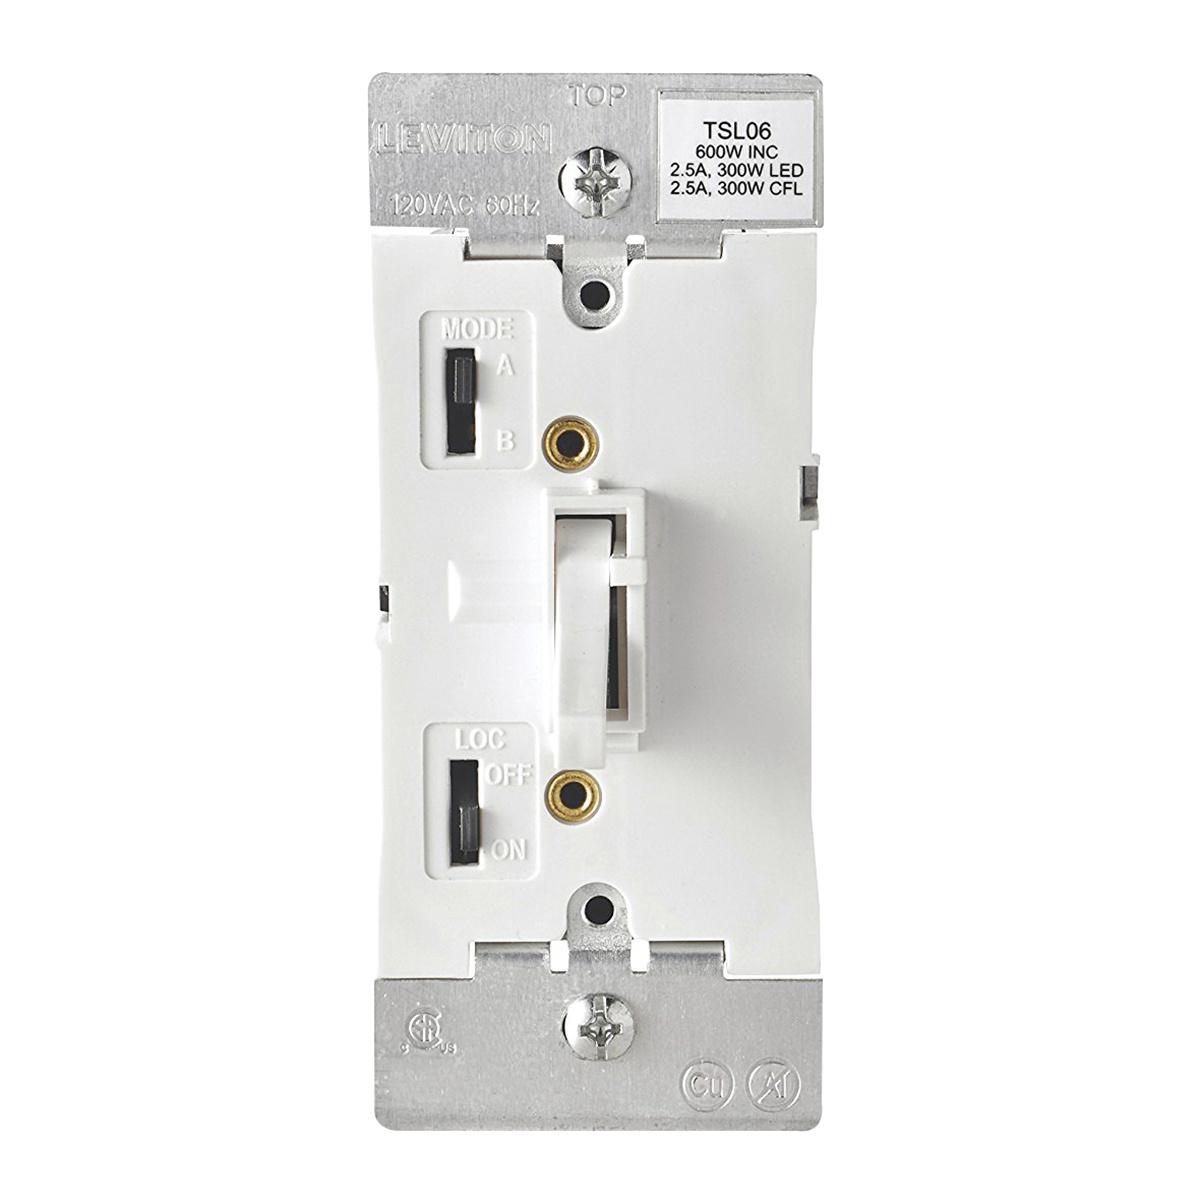 Leviton Tsl06 1lw 1 Pole 120 Volt Ac 3 Way Electro Mechanical Switch 2 Dimmers